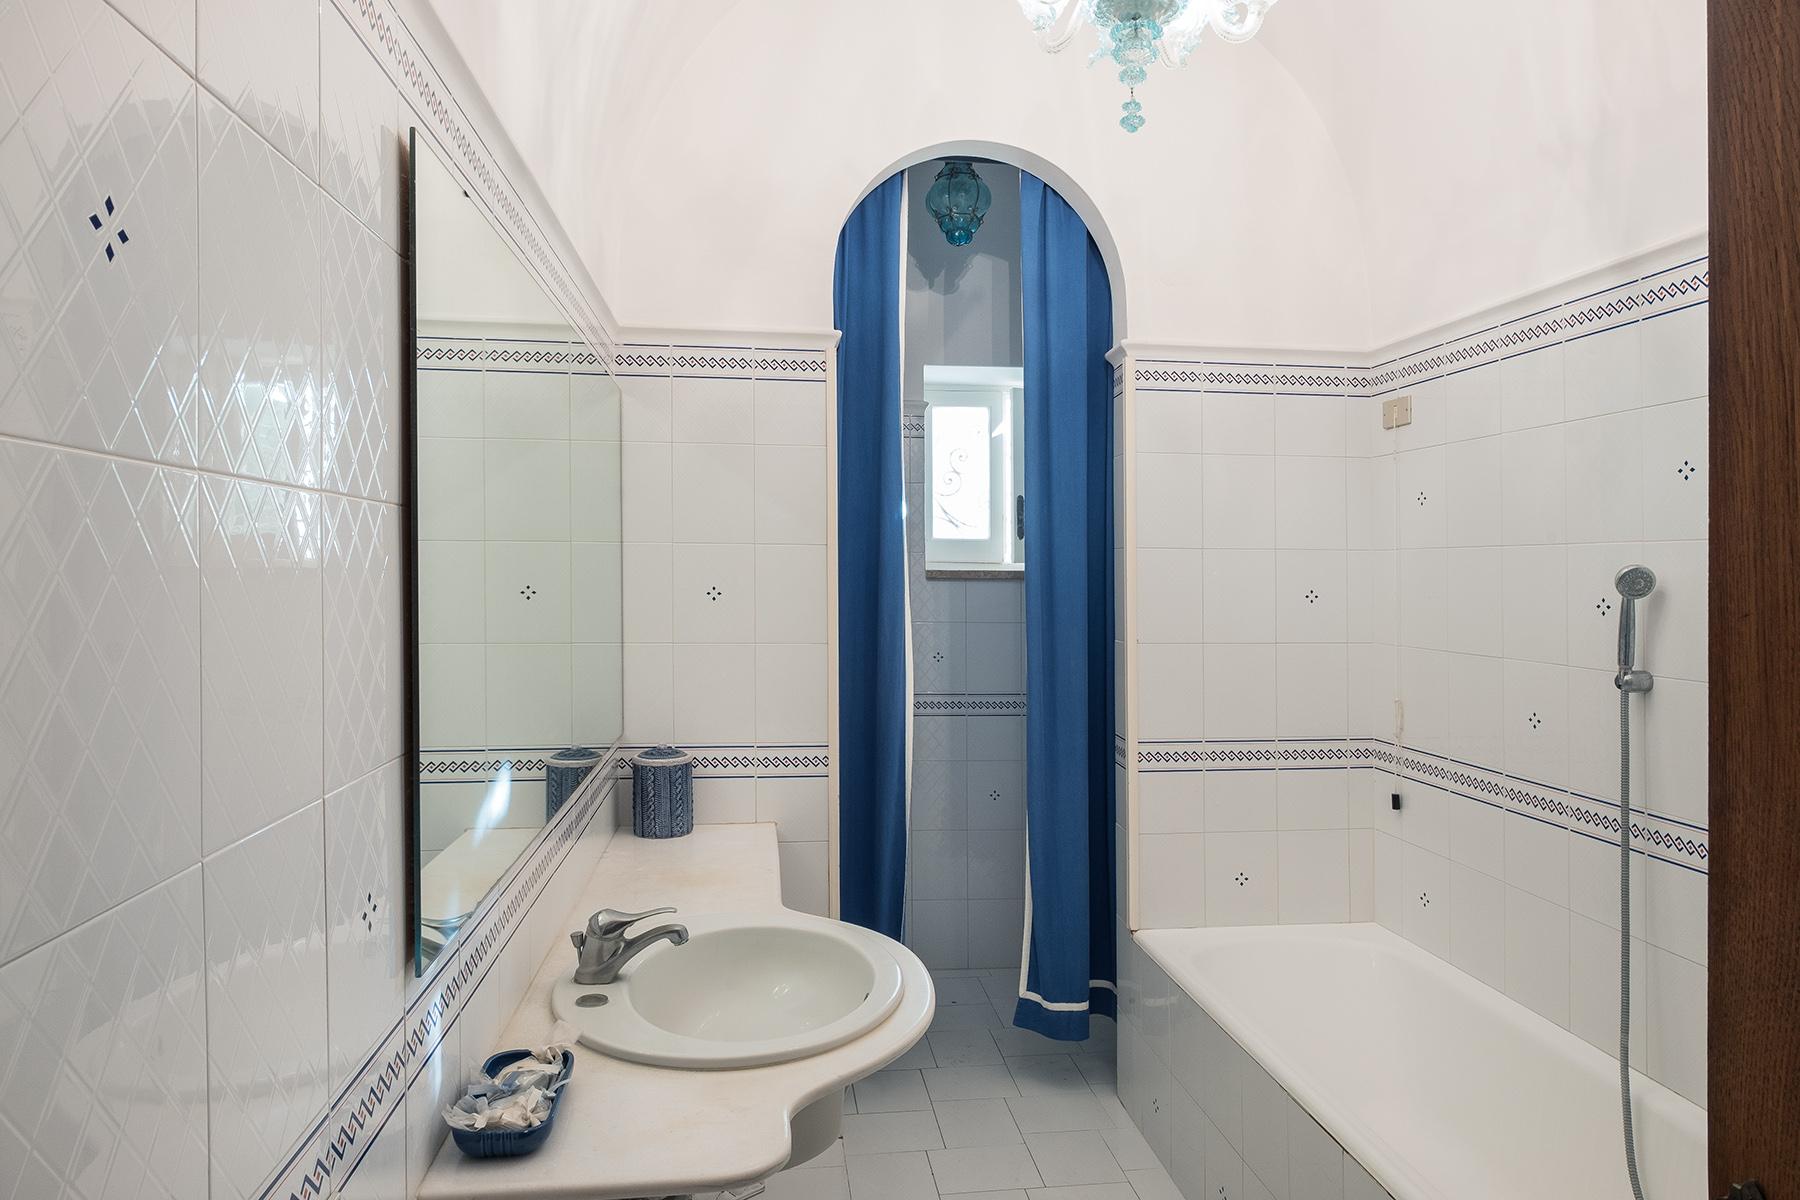 Casa indipendente in Vendita a Capri: 5 locali, 400 mq - Foto 18